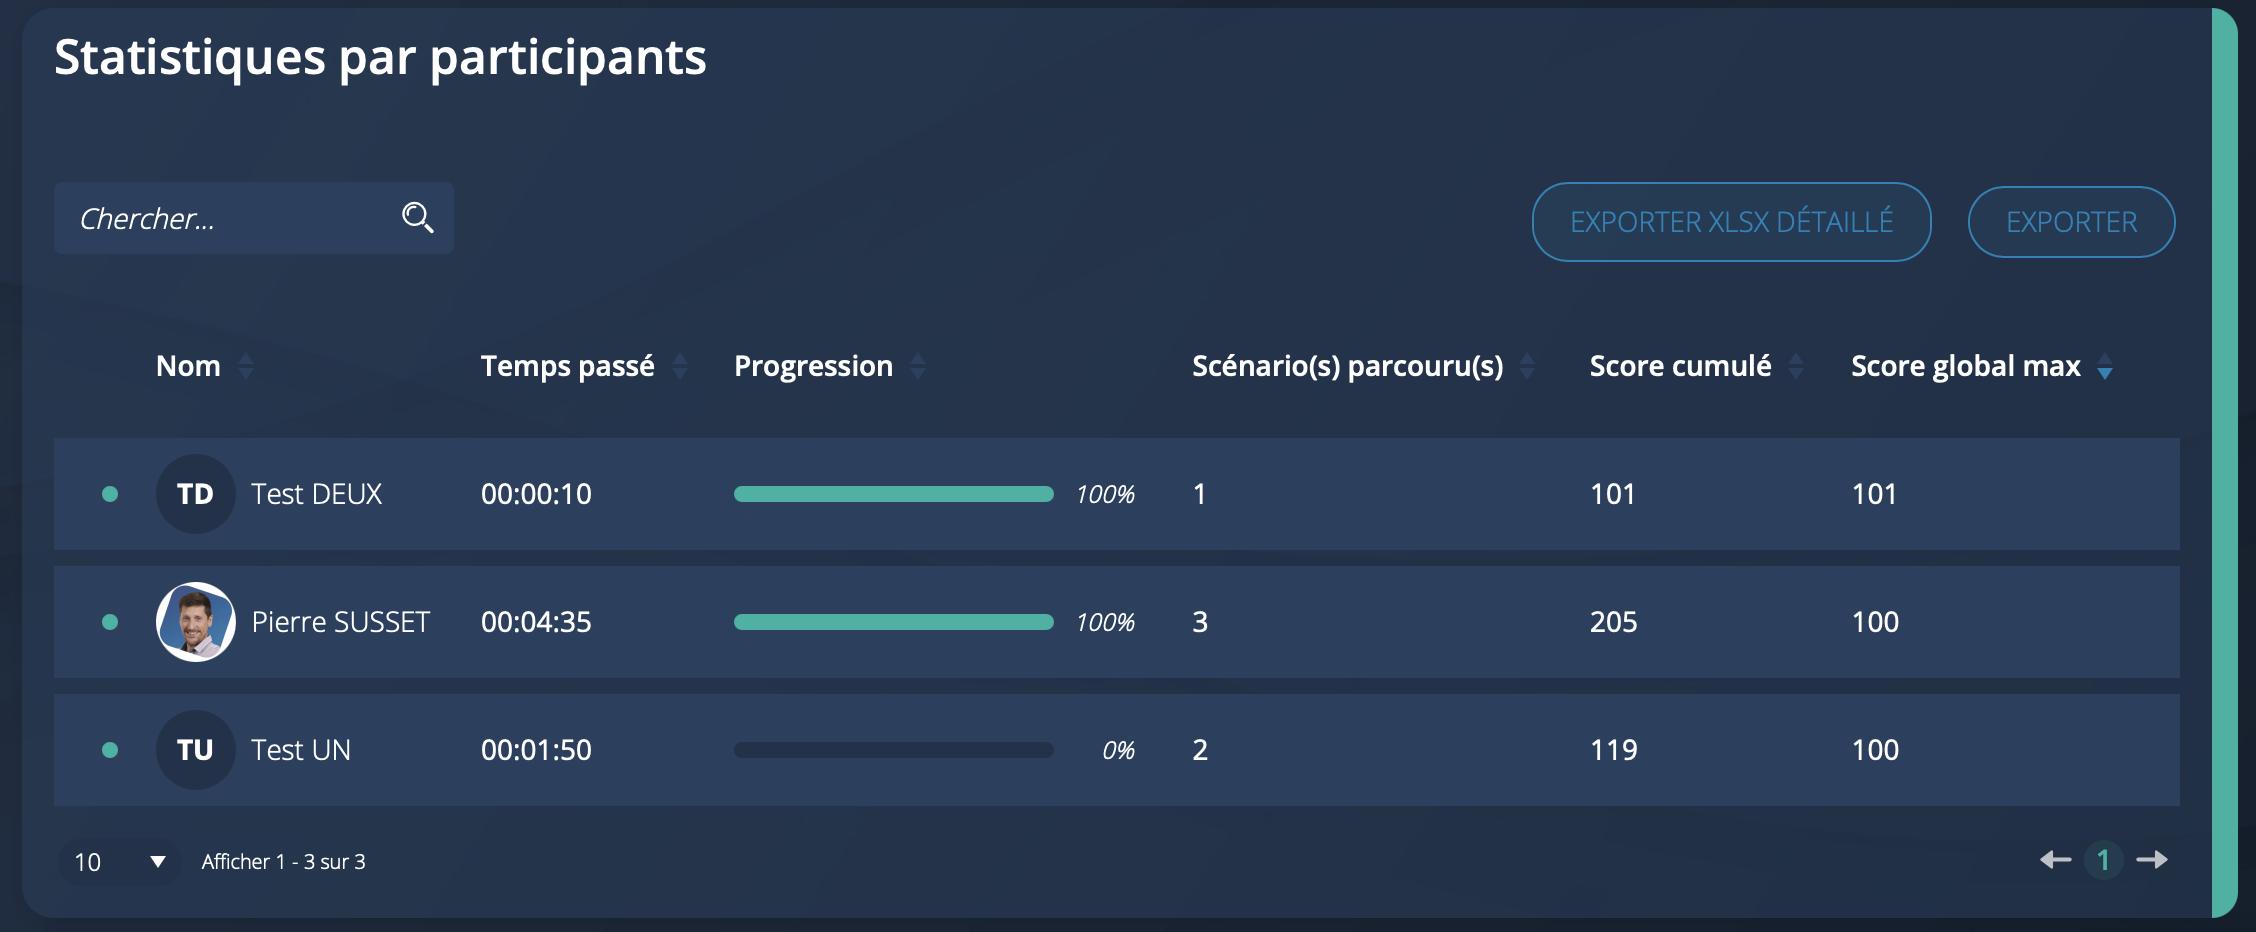 perform_stat_global2.png (290 KB)